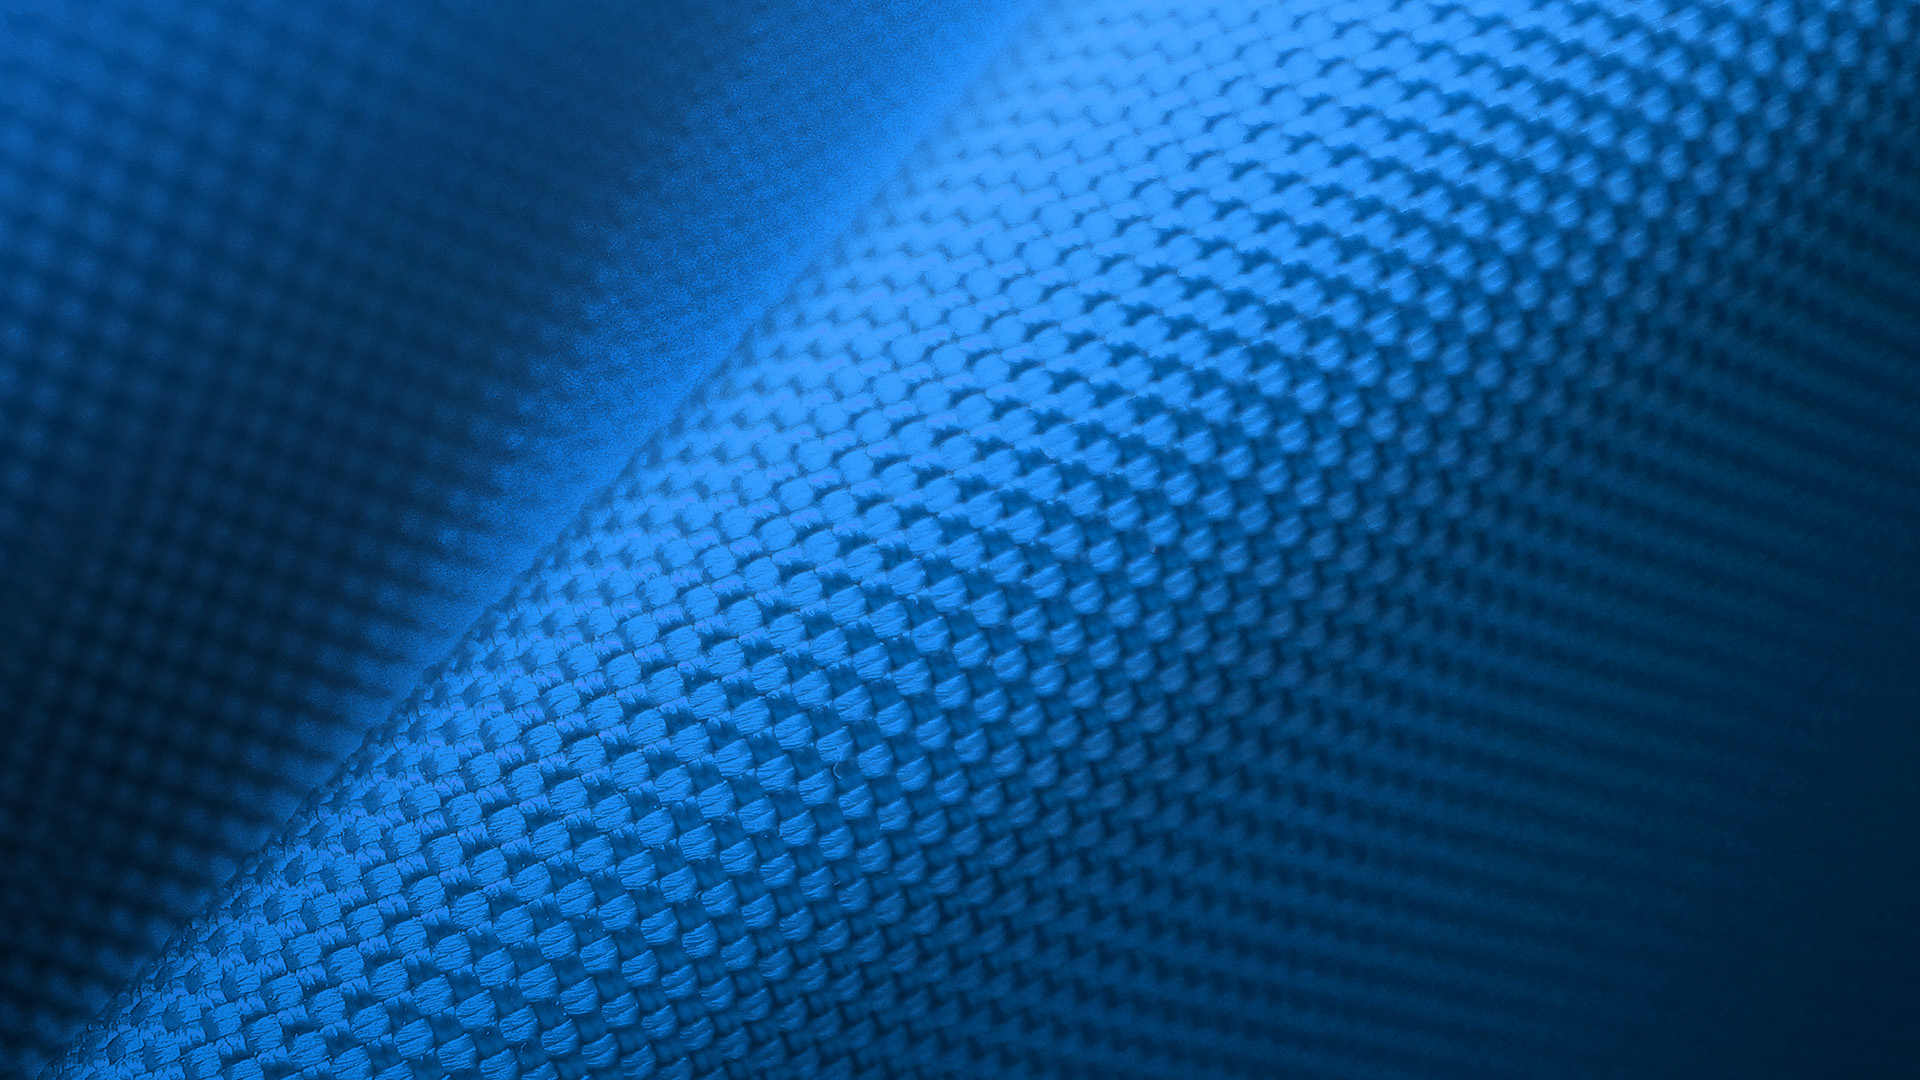 wallpaper for desktop, laptop | vn01-blue-silk-pattern